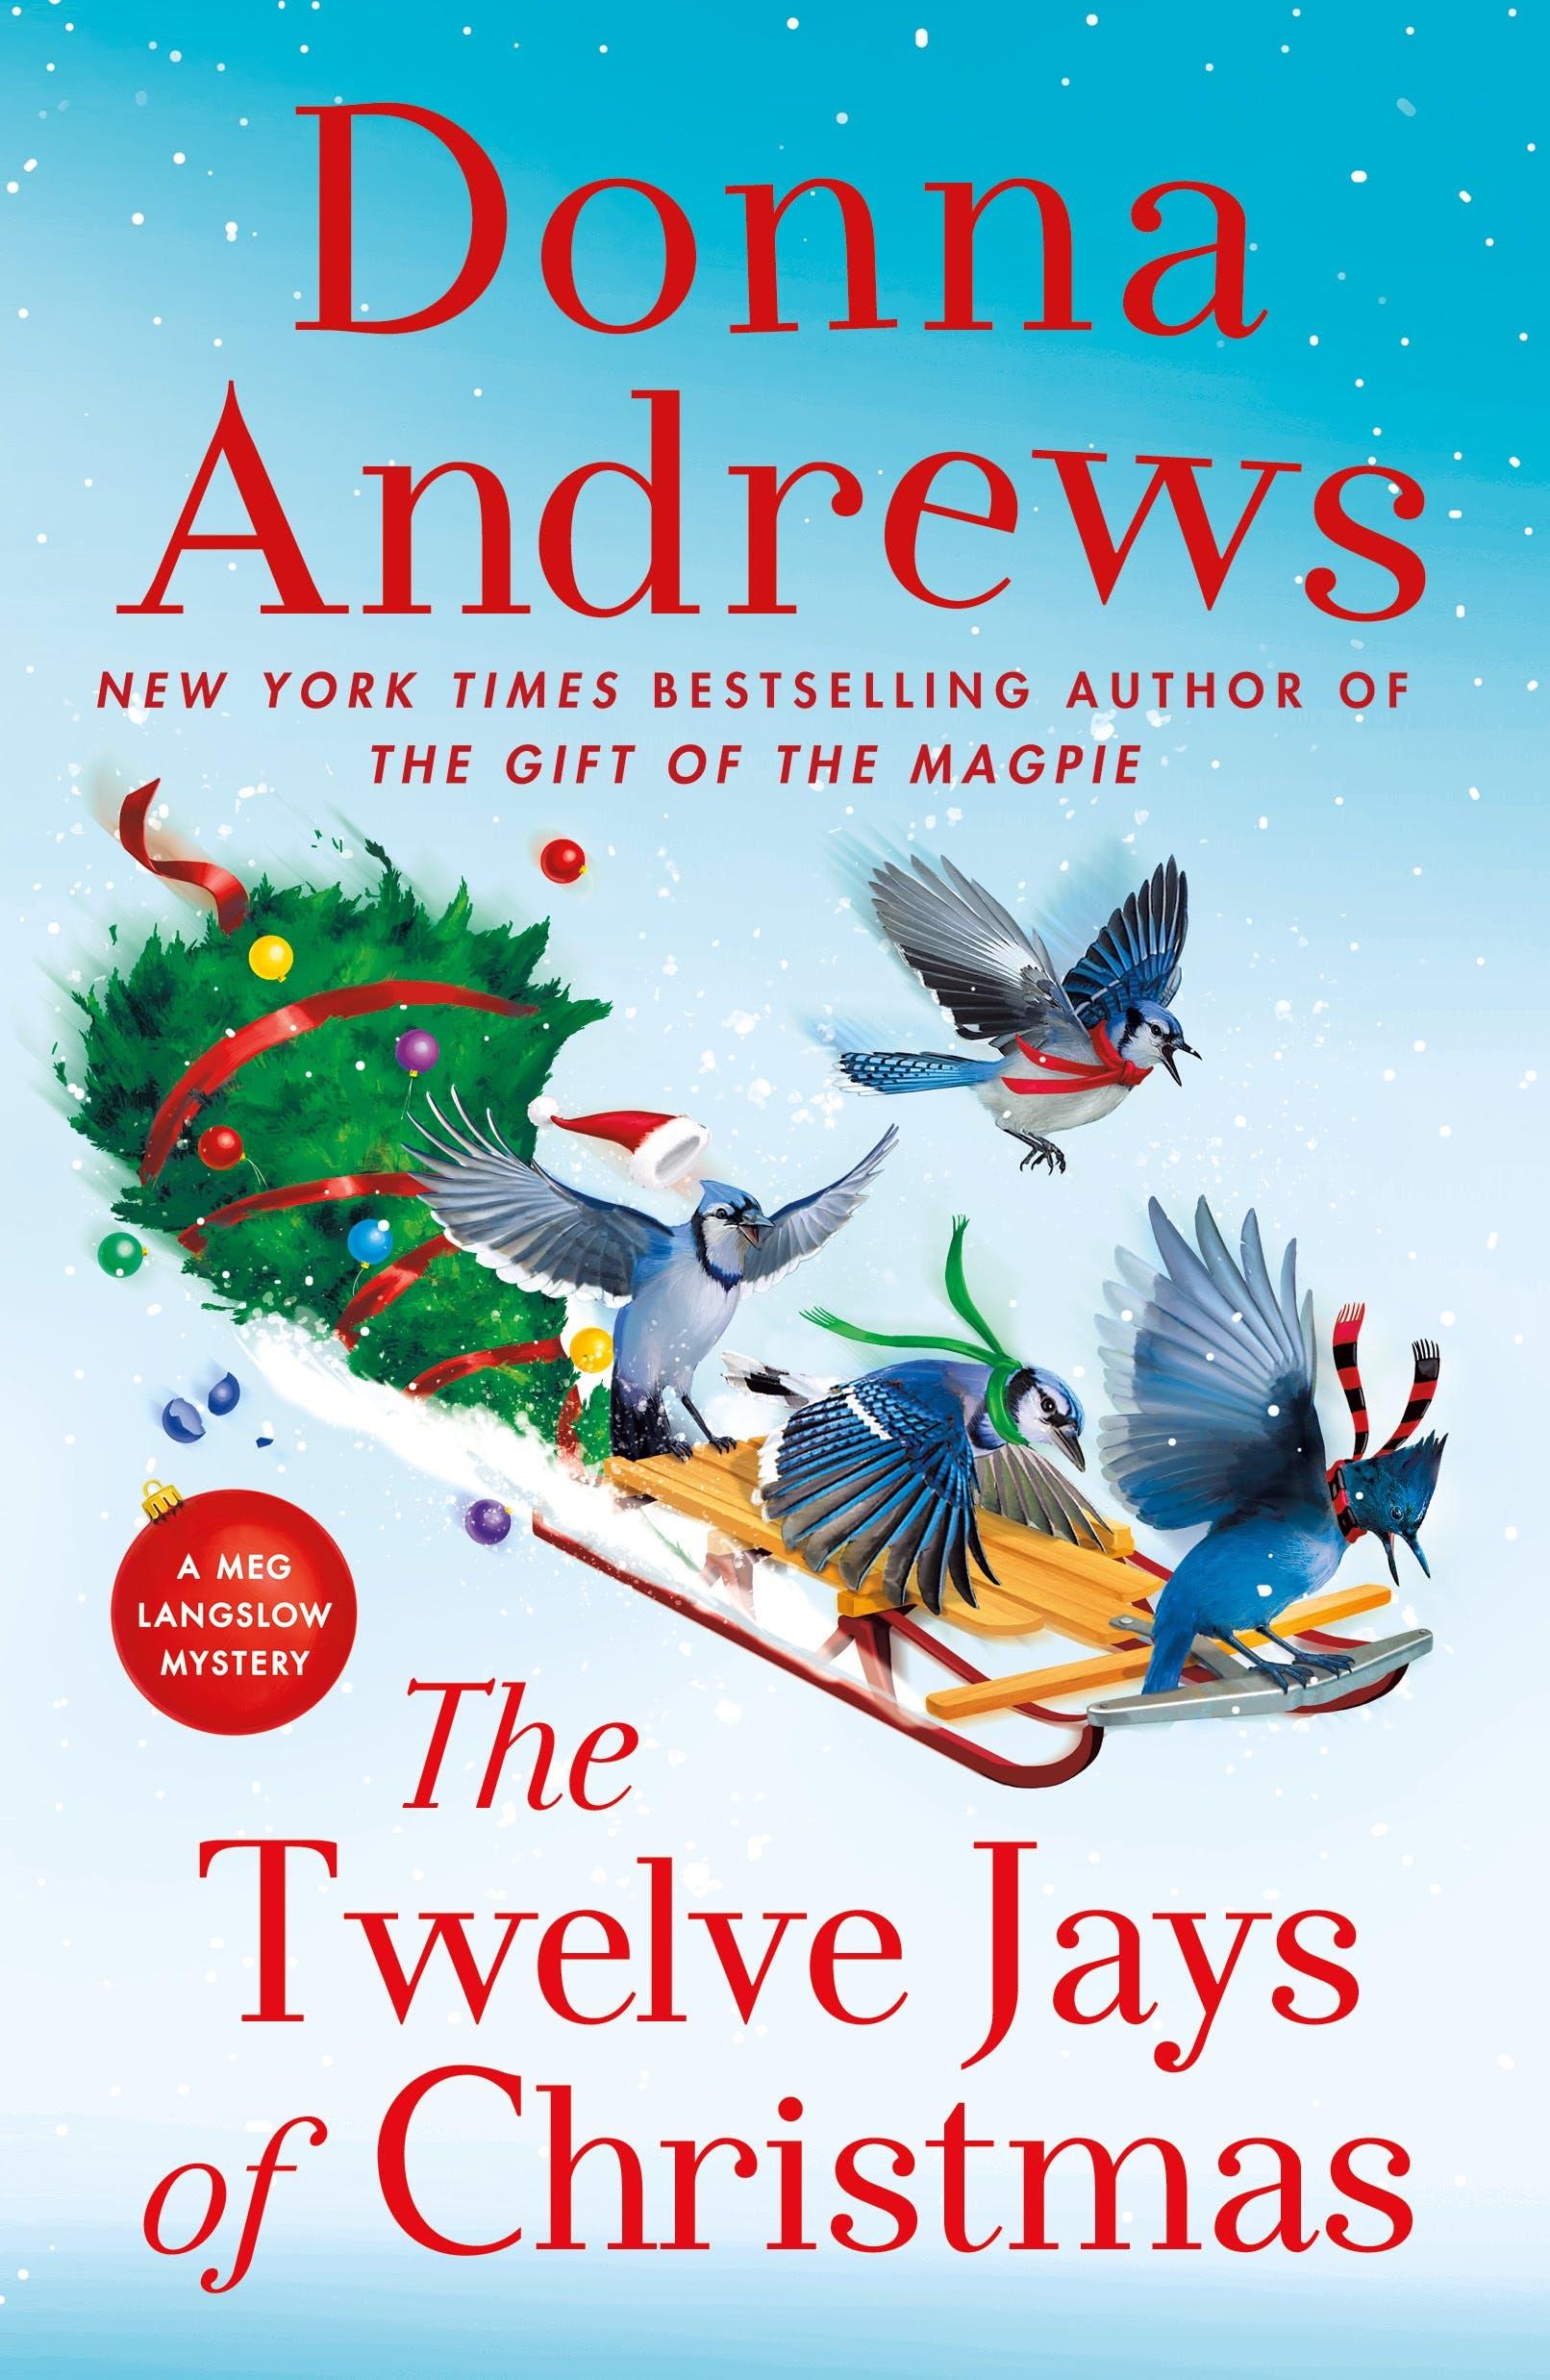 Image of The Twelve Jays of Christmas